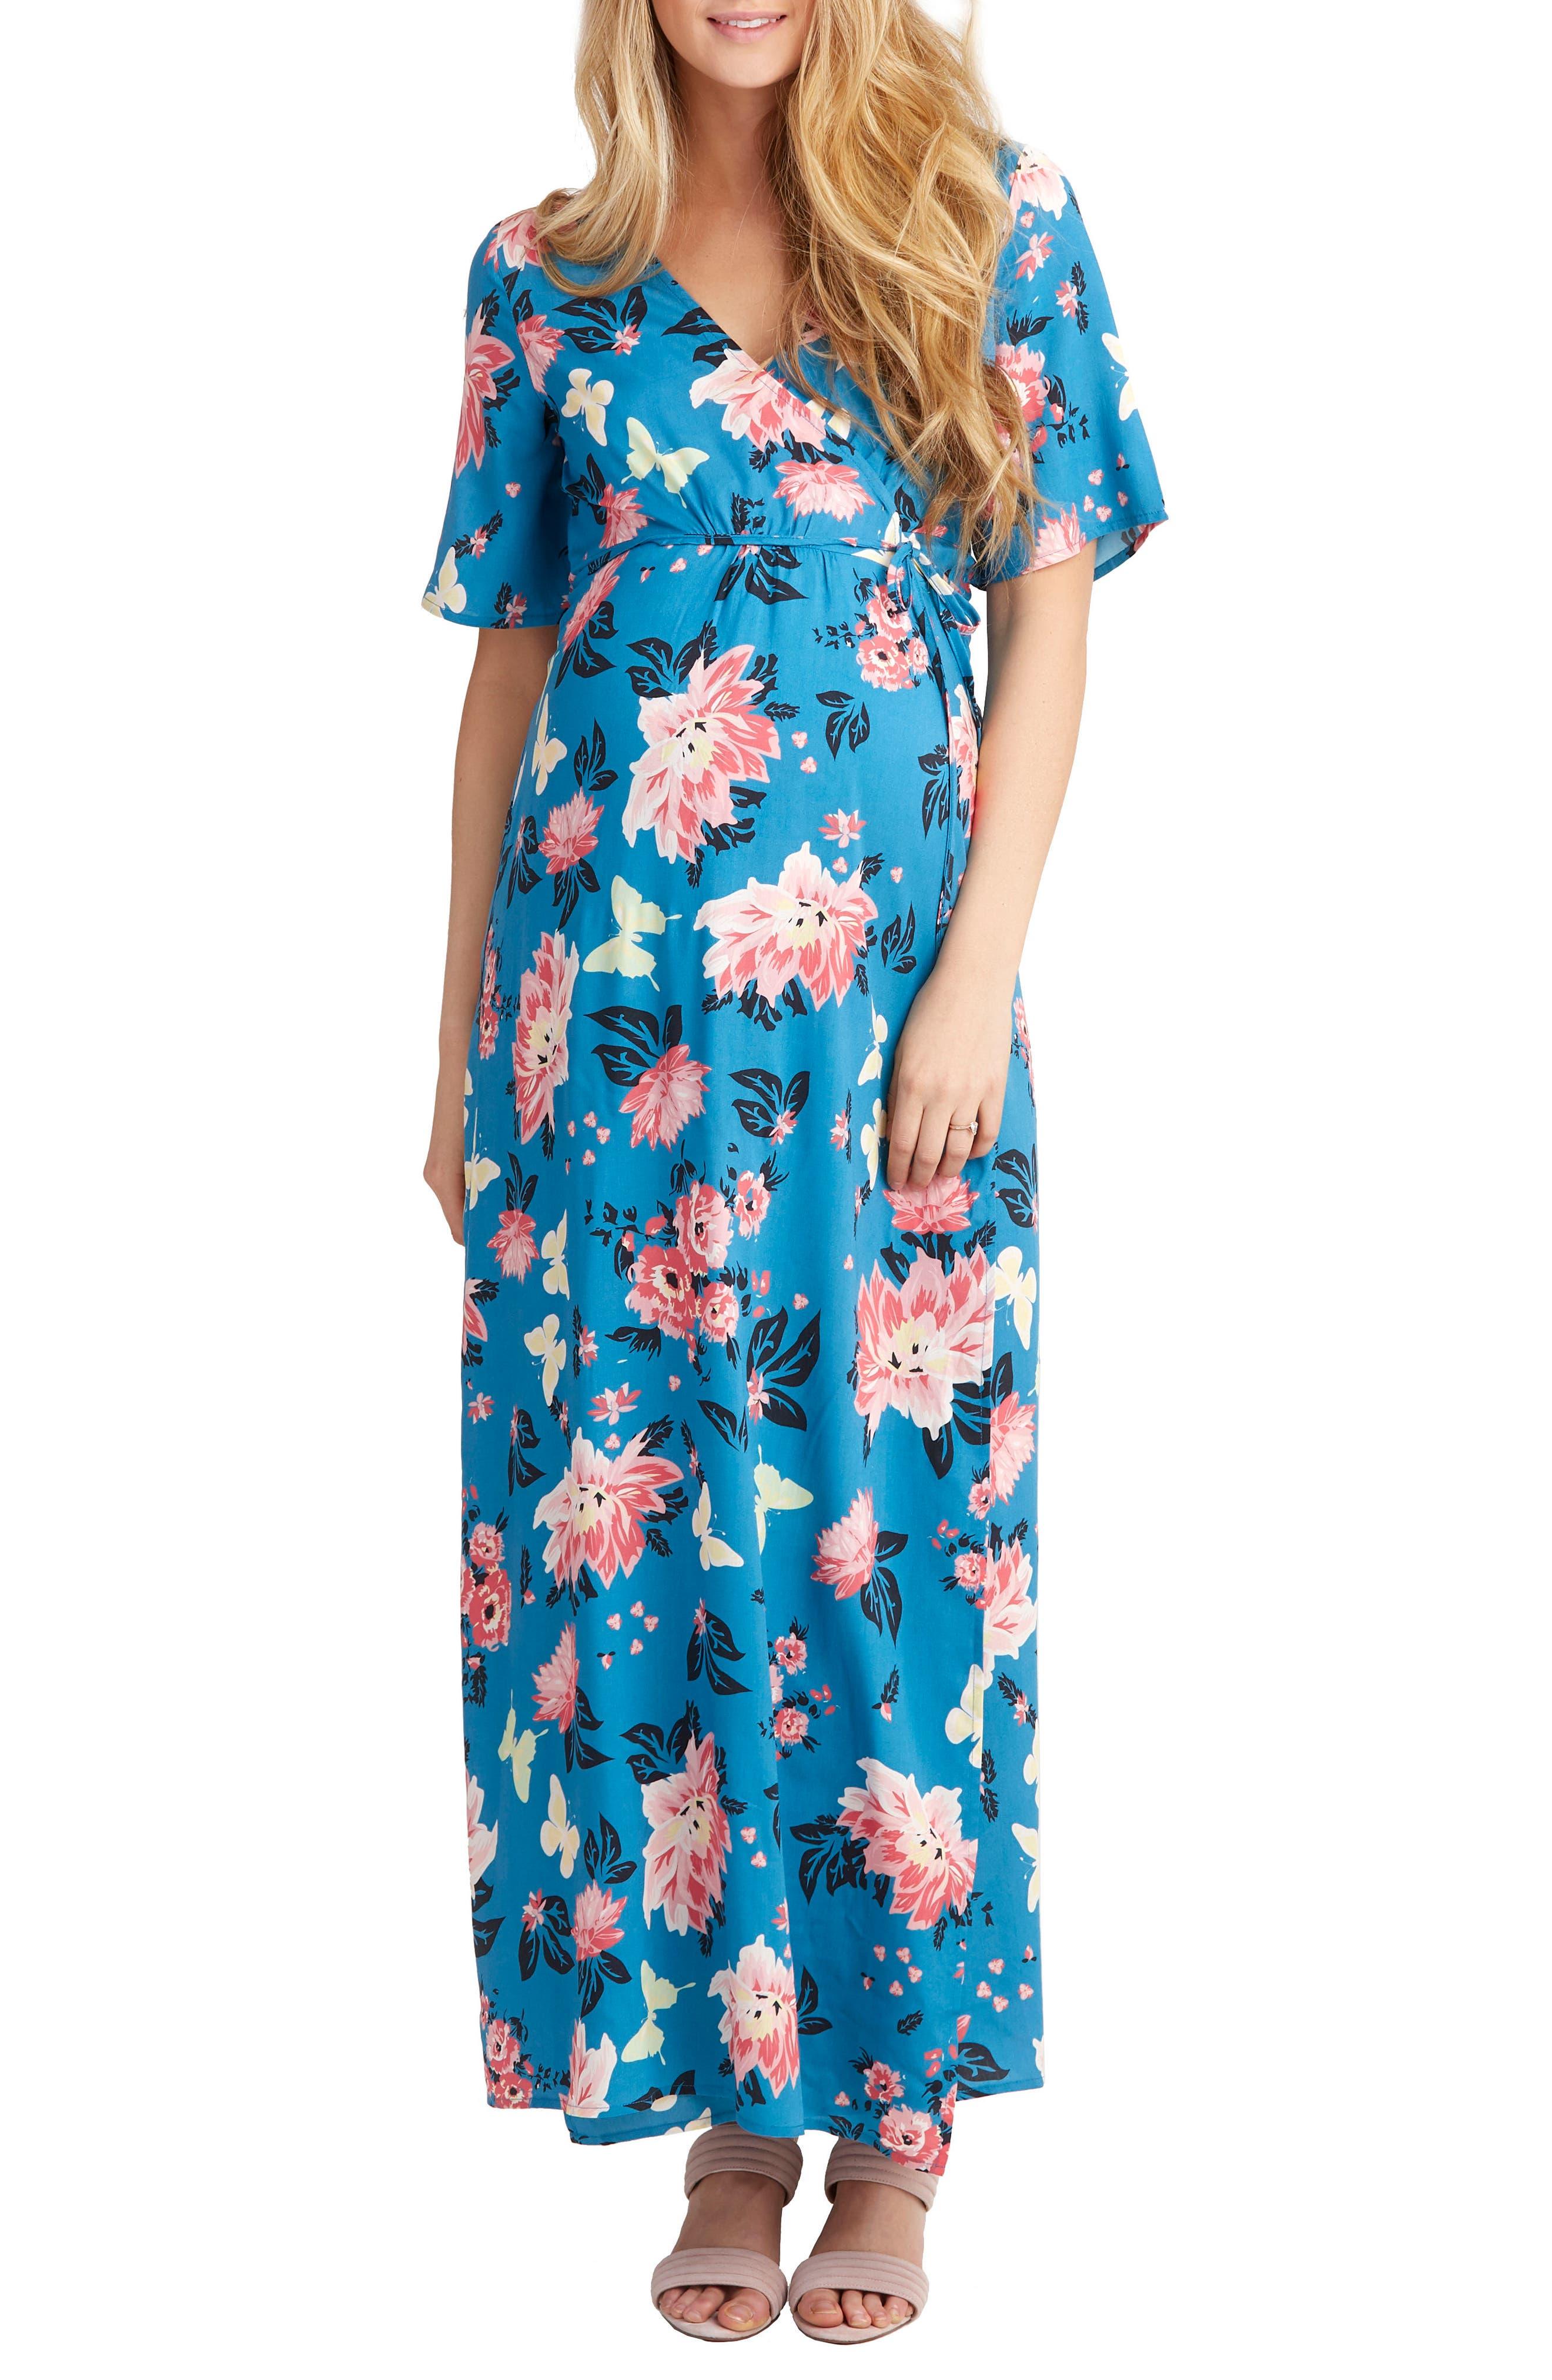 NOM MATERNITY Landon Maxi Wrap Maternity/Nursing Dress, Main, color, FLORAL